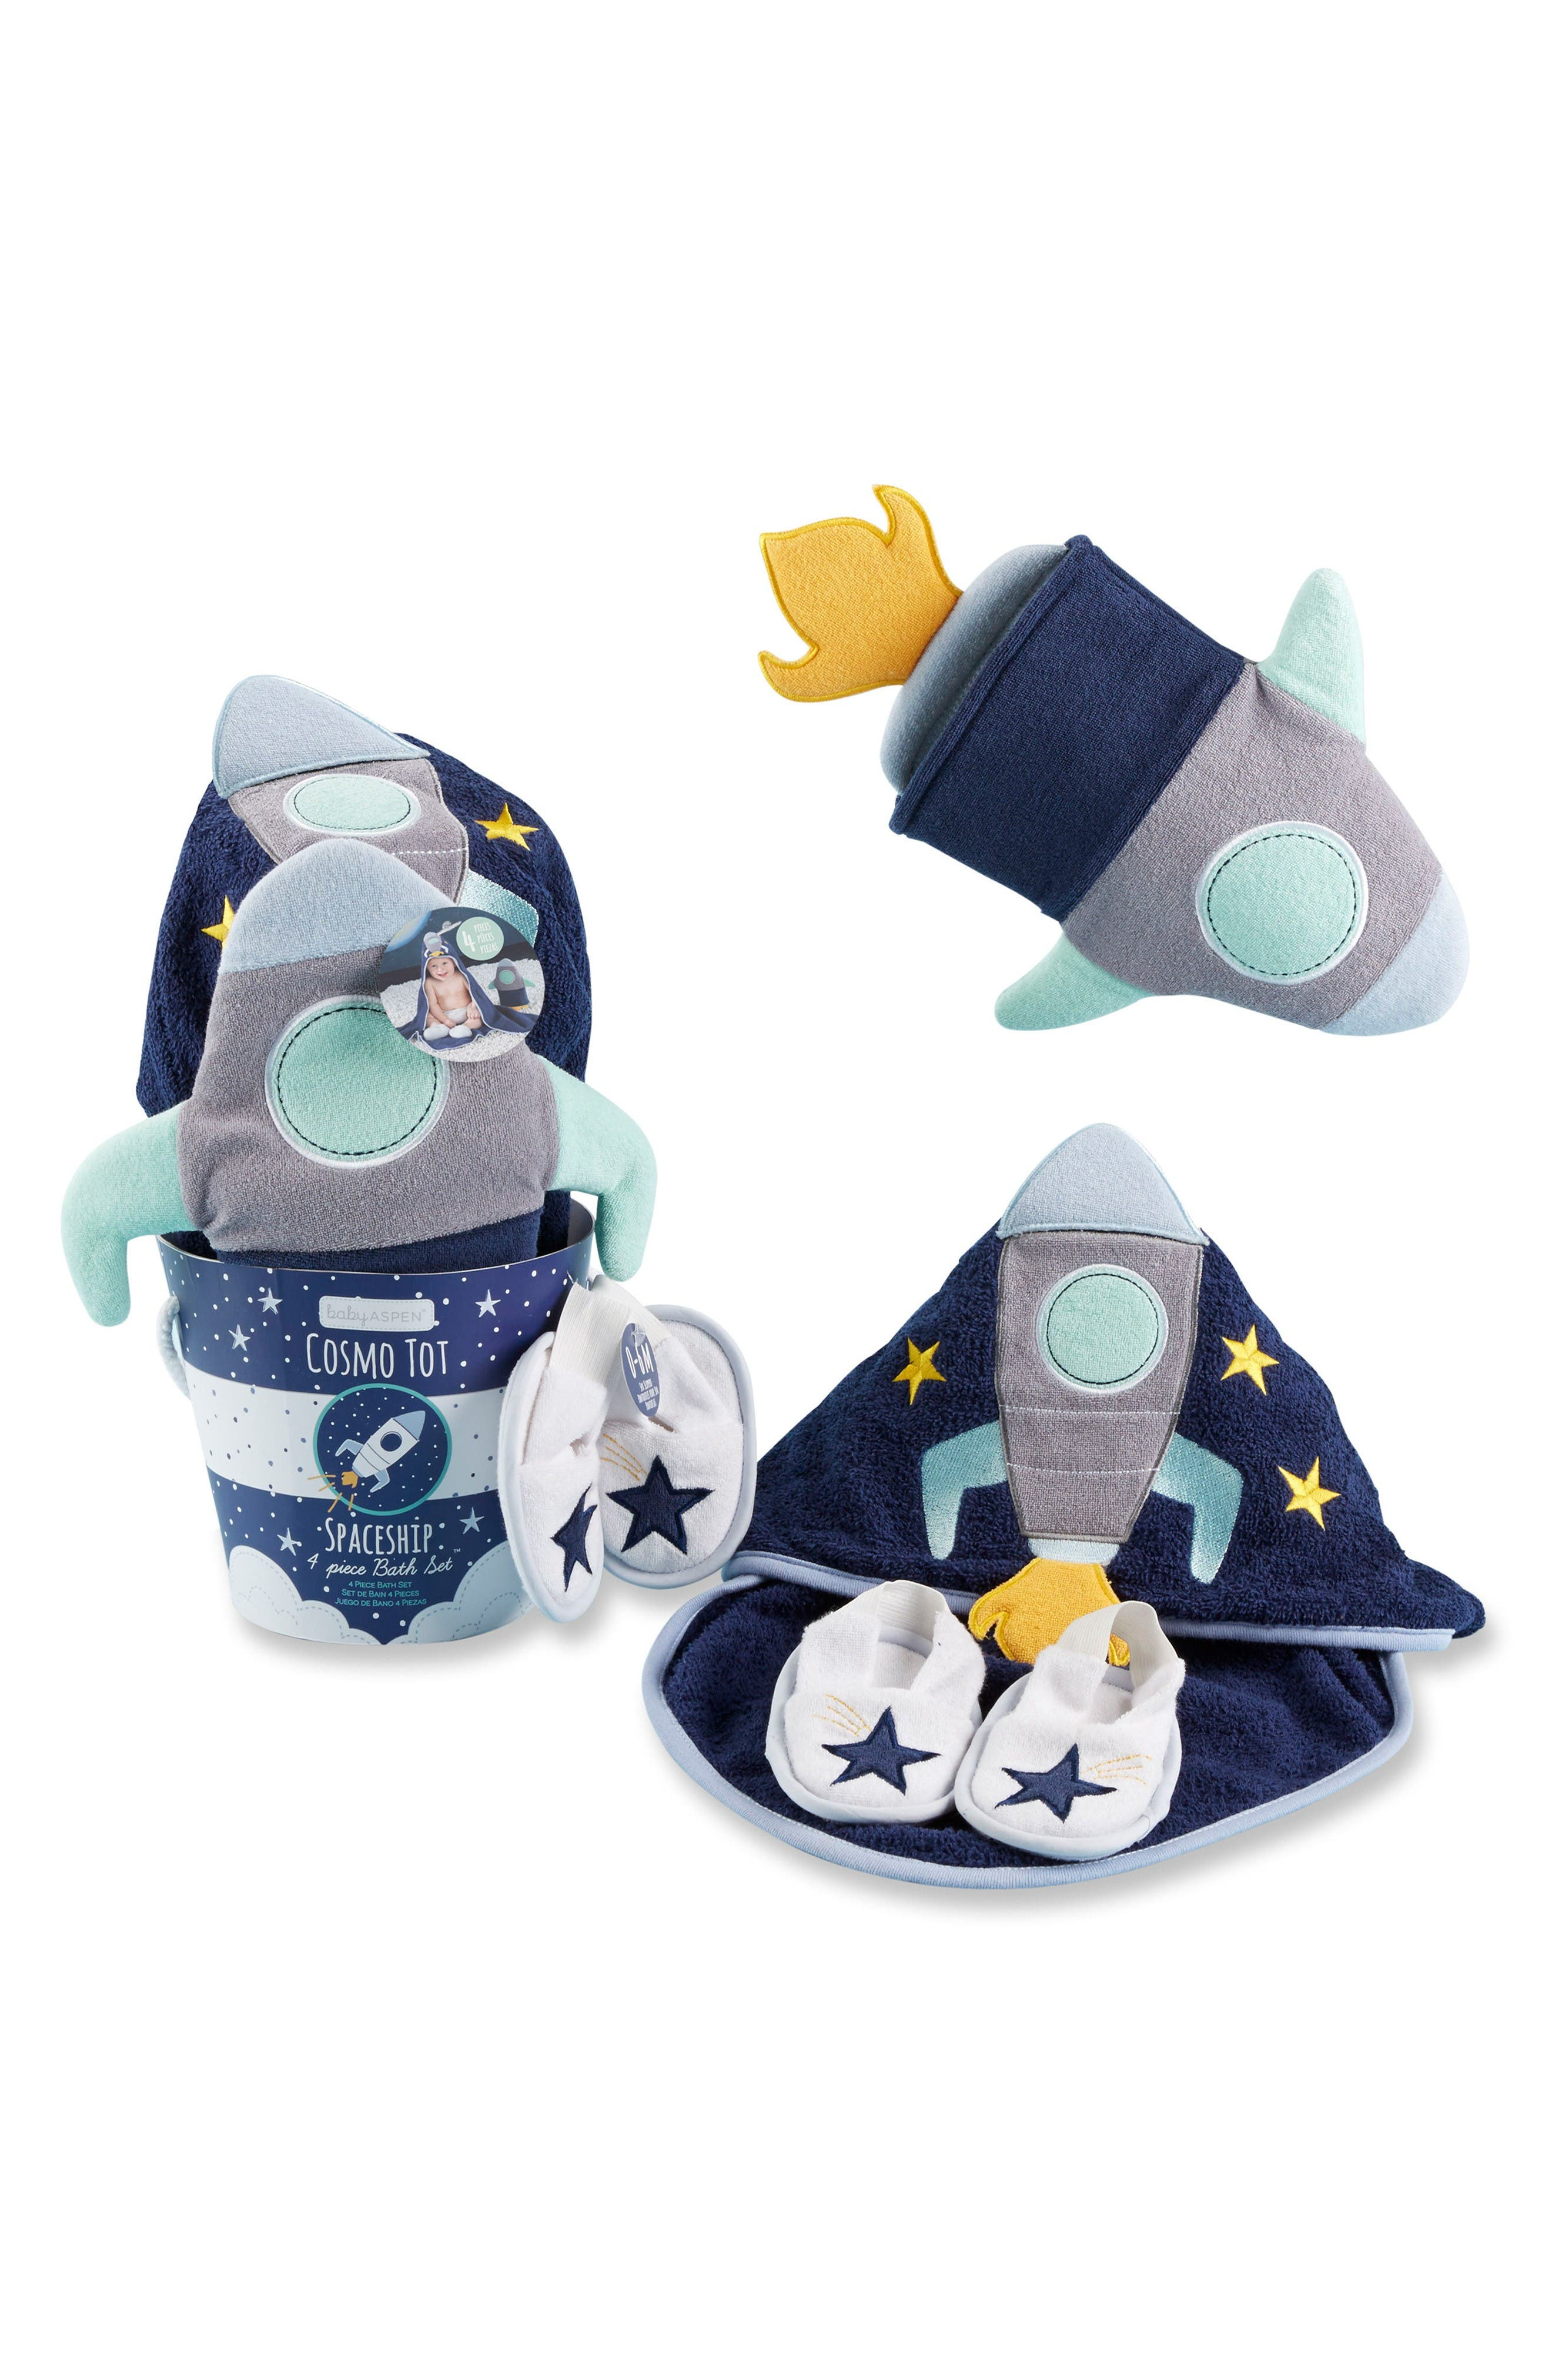 Baby Aspen Cosmo Tot 4-Piece Bath Gift Set